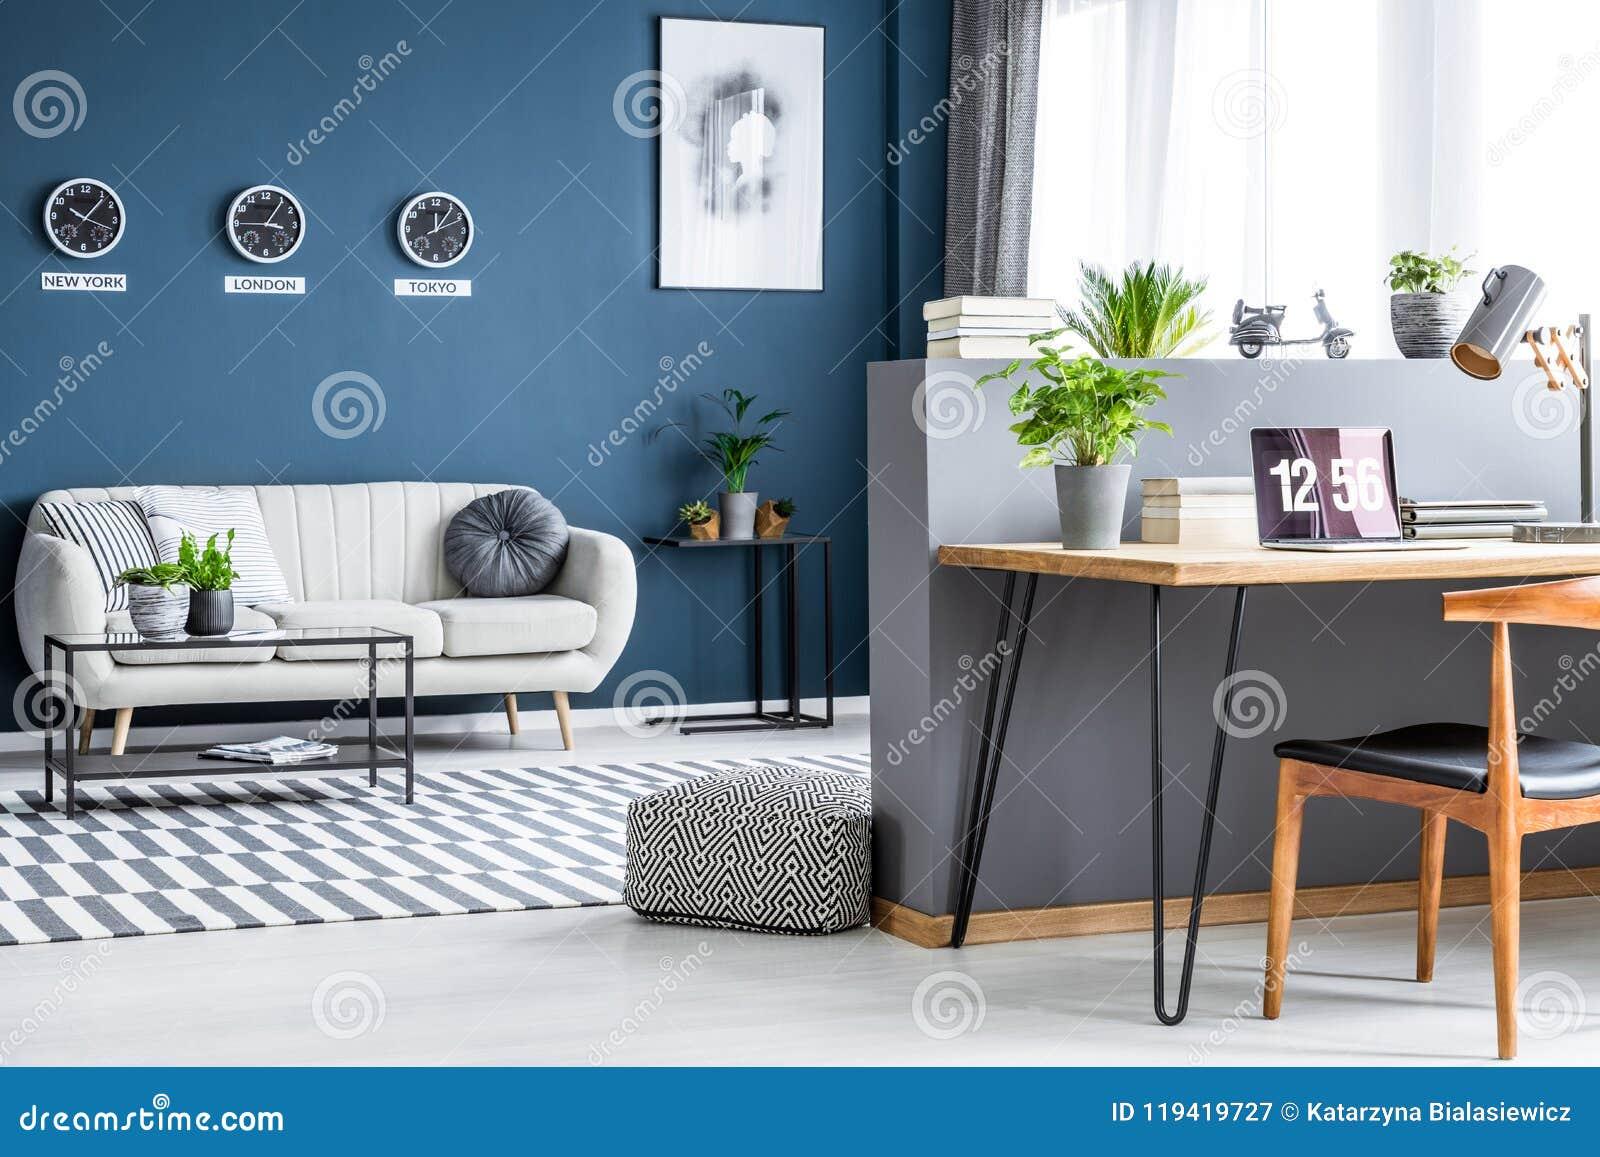 Синий интерьер с 3 часами, простой плакат живущей комнаты,